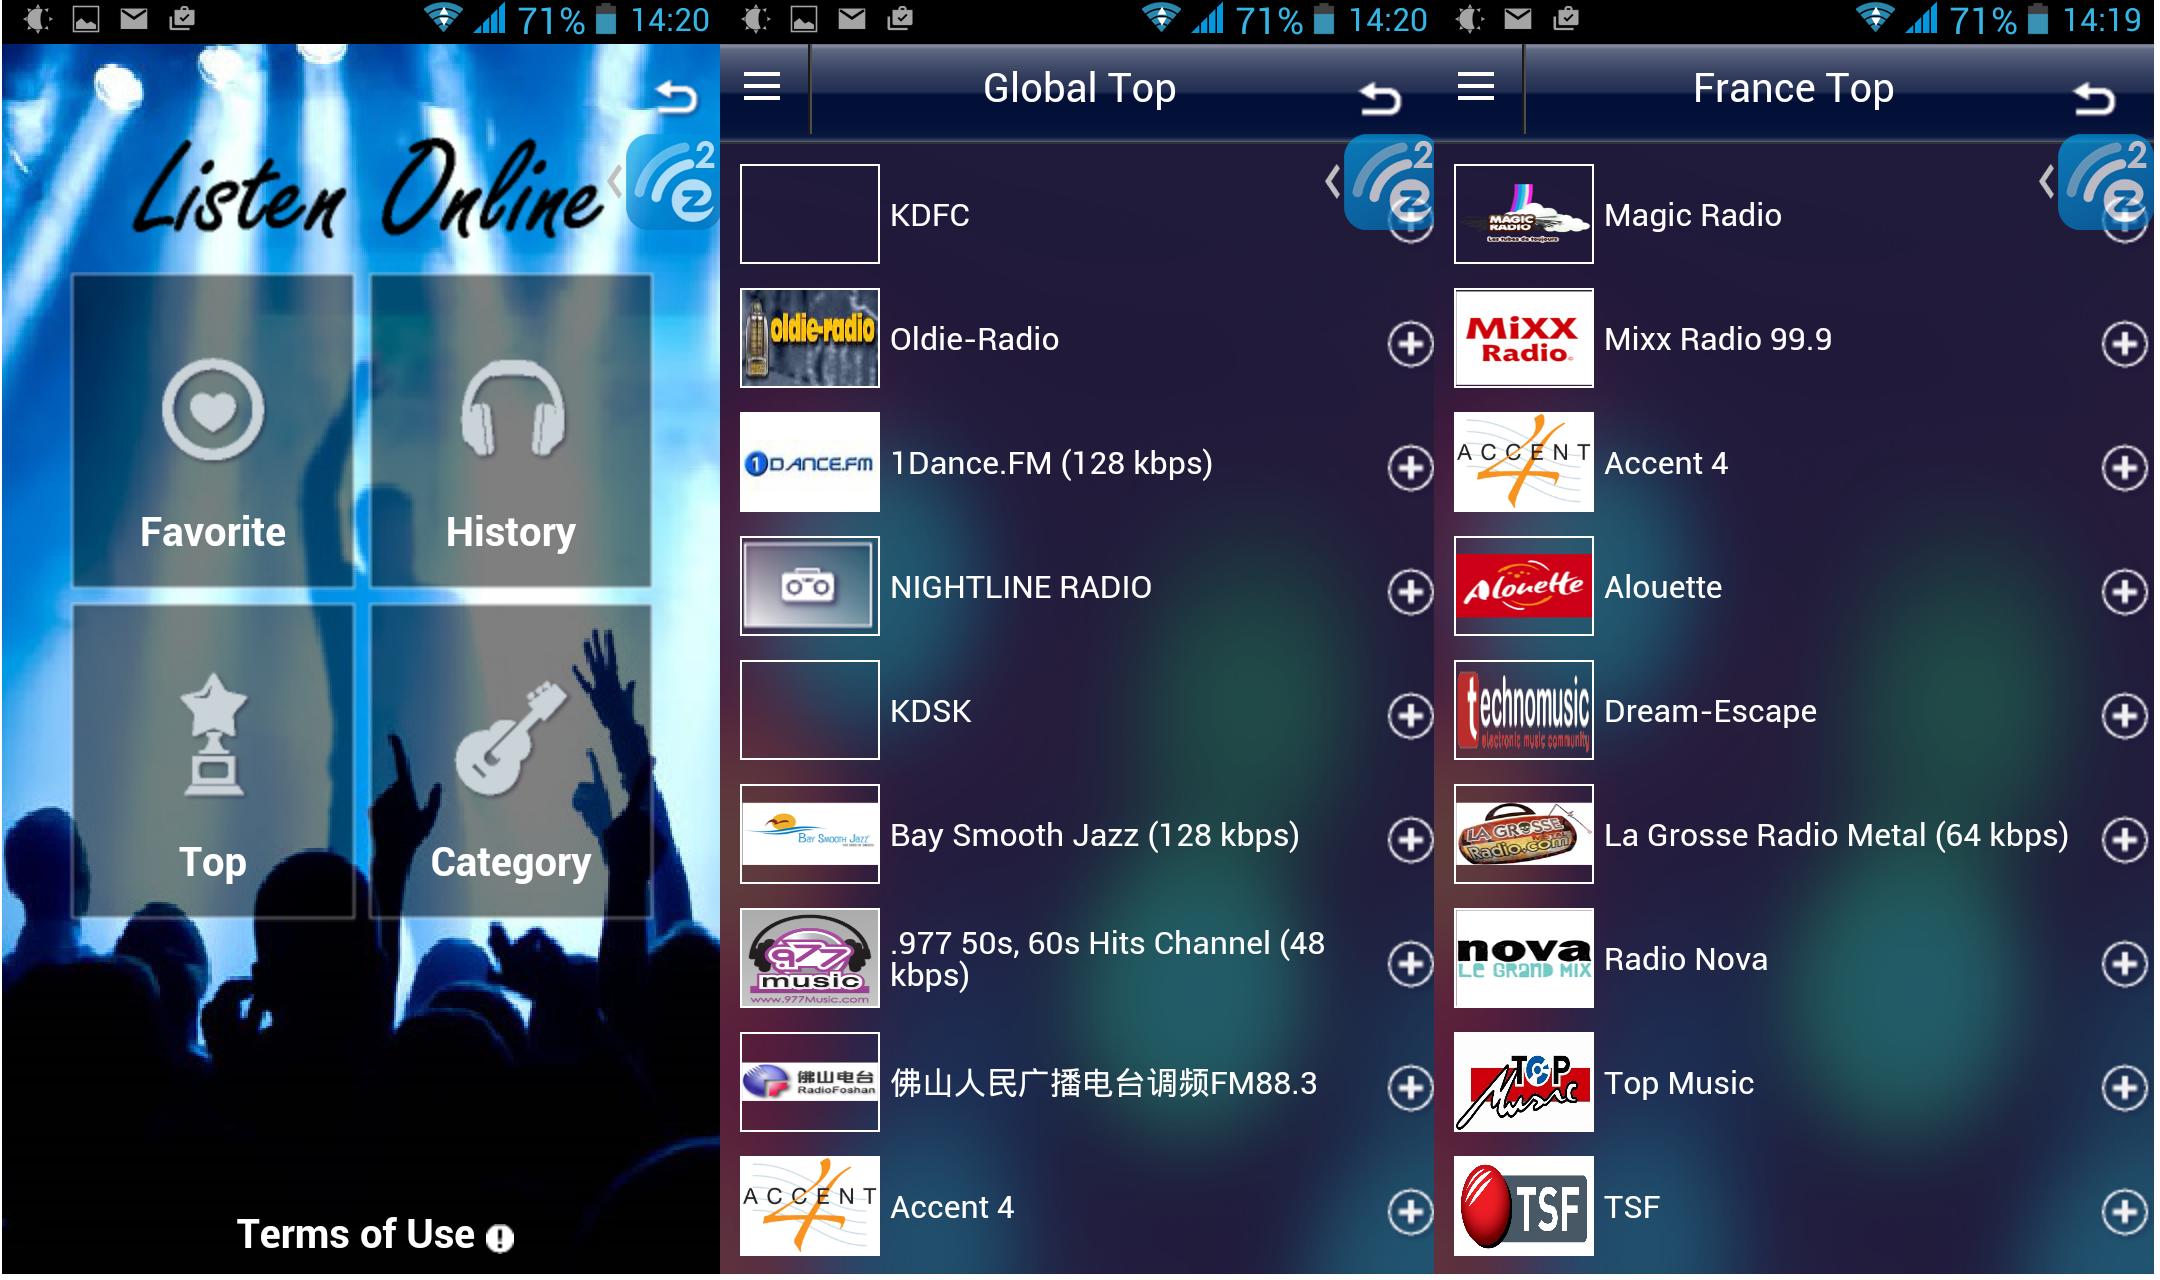 SoundMate WM201 Wi-Fi Music Streamer (EZMusic) Review